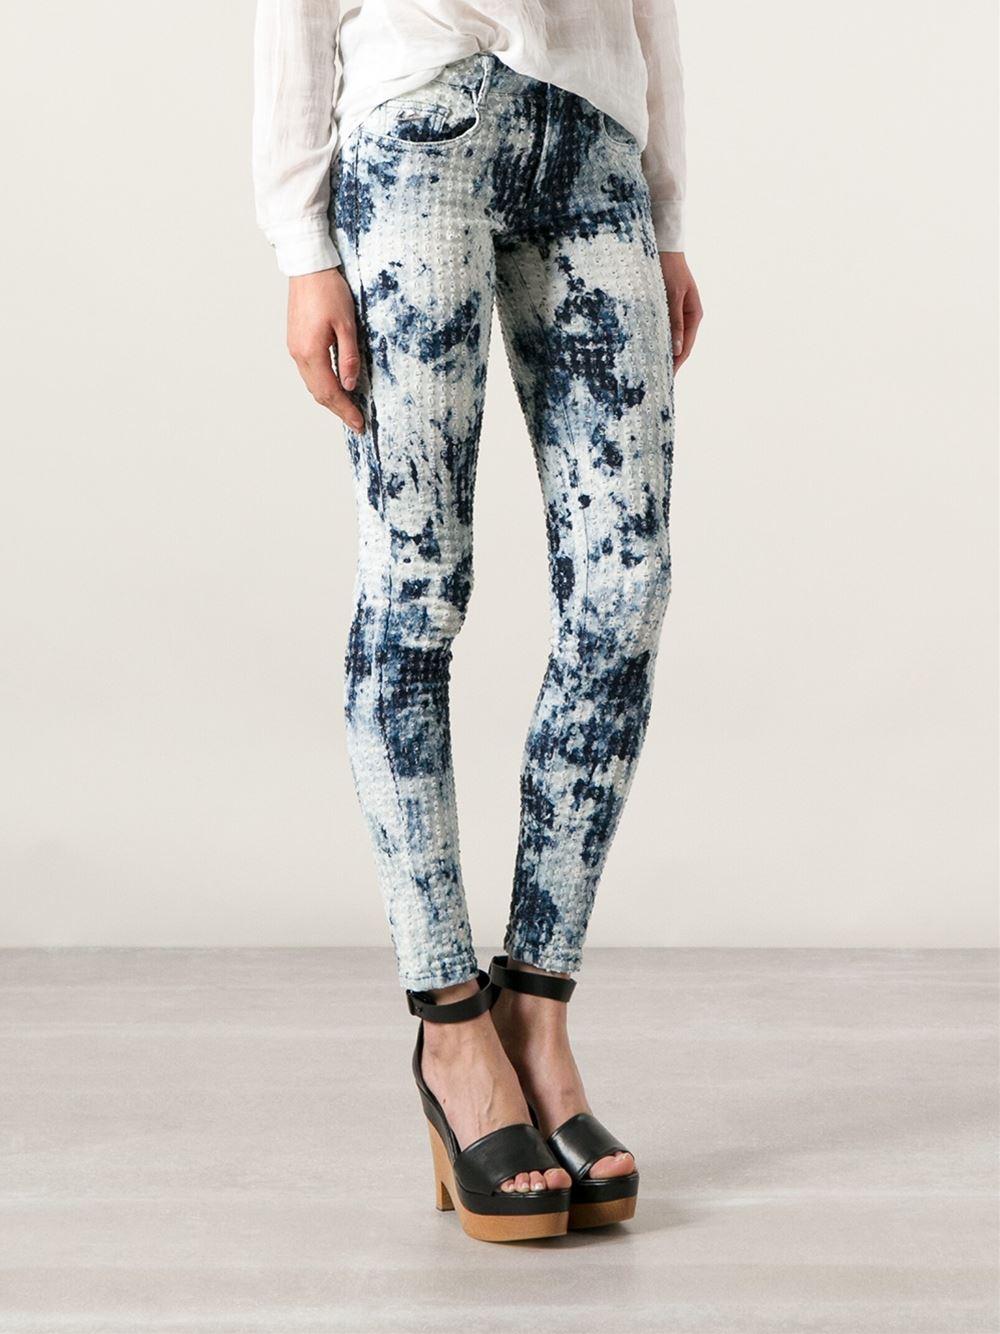 Luca Taiana Skinny Jeans - Tessabit - Farfetch.com